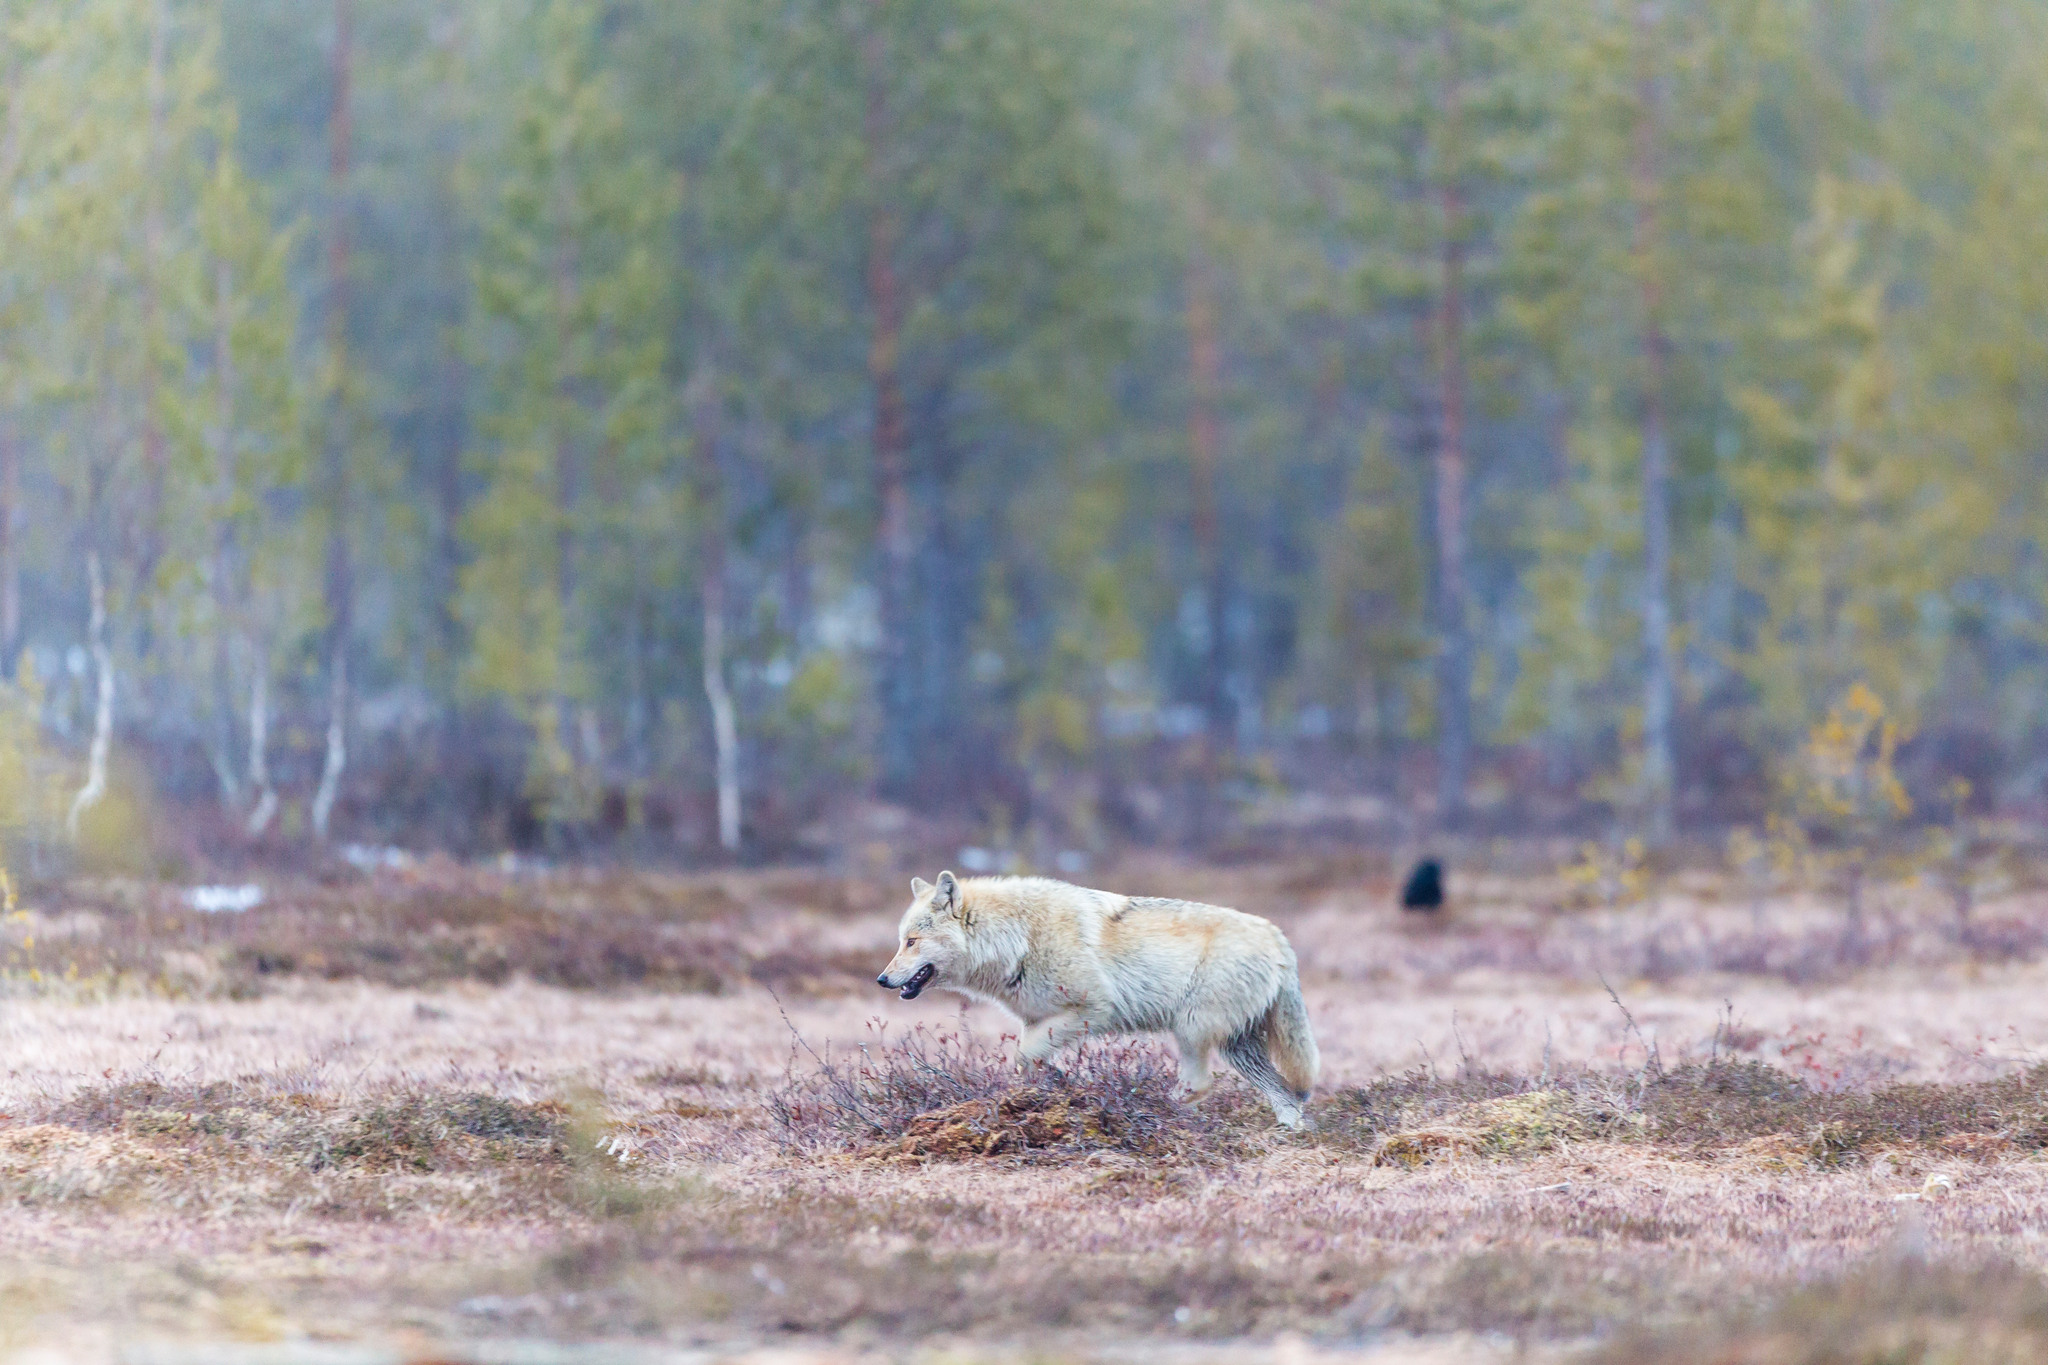 Foto: Kjell-Erik Moseid